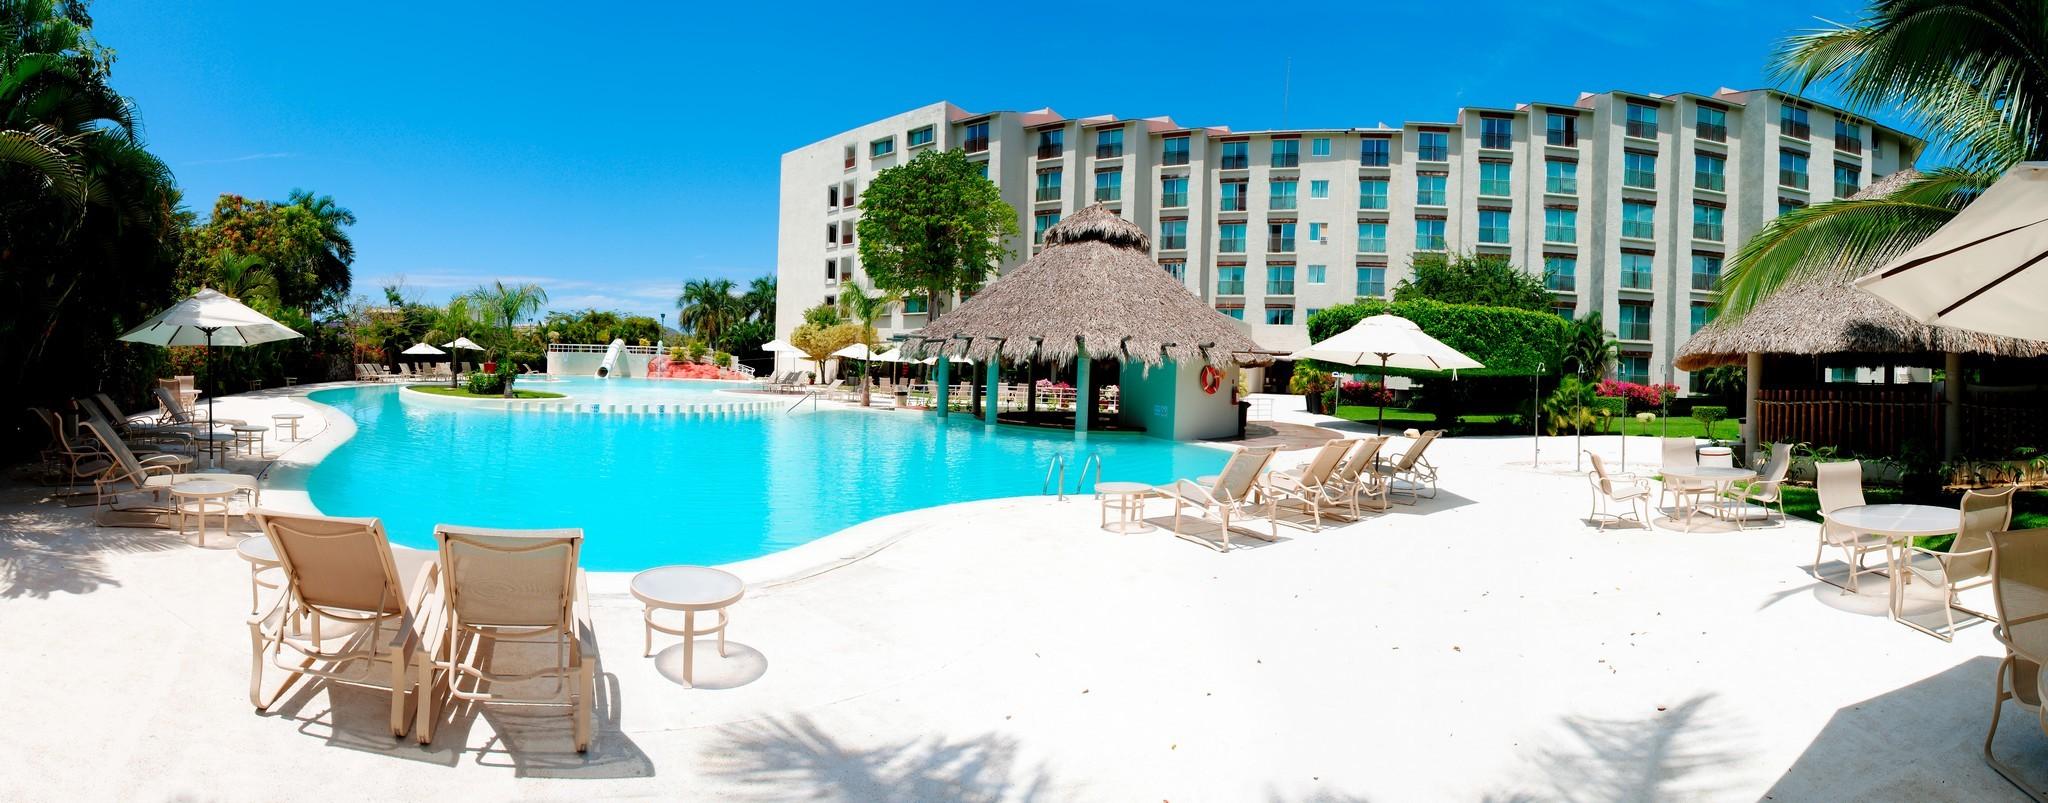 Panoramica del hotel Gamma de Fiesta Inn Plaza Ixtapa